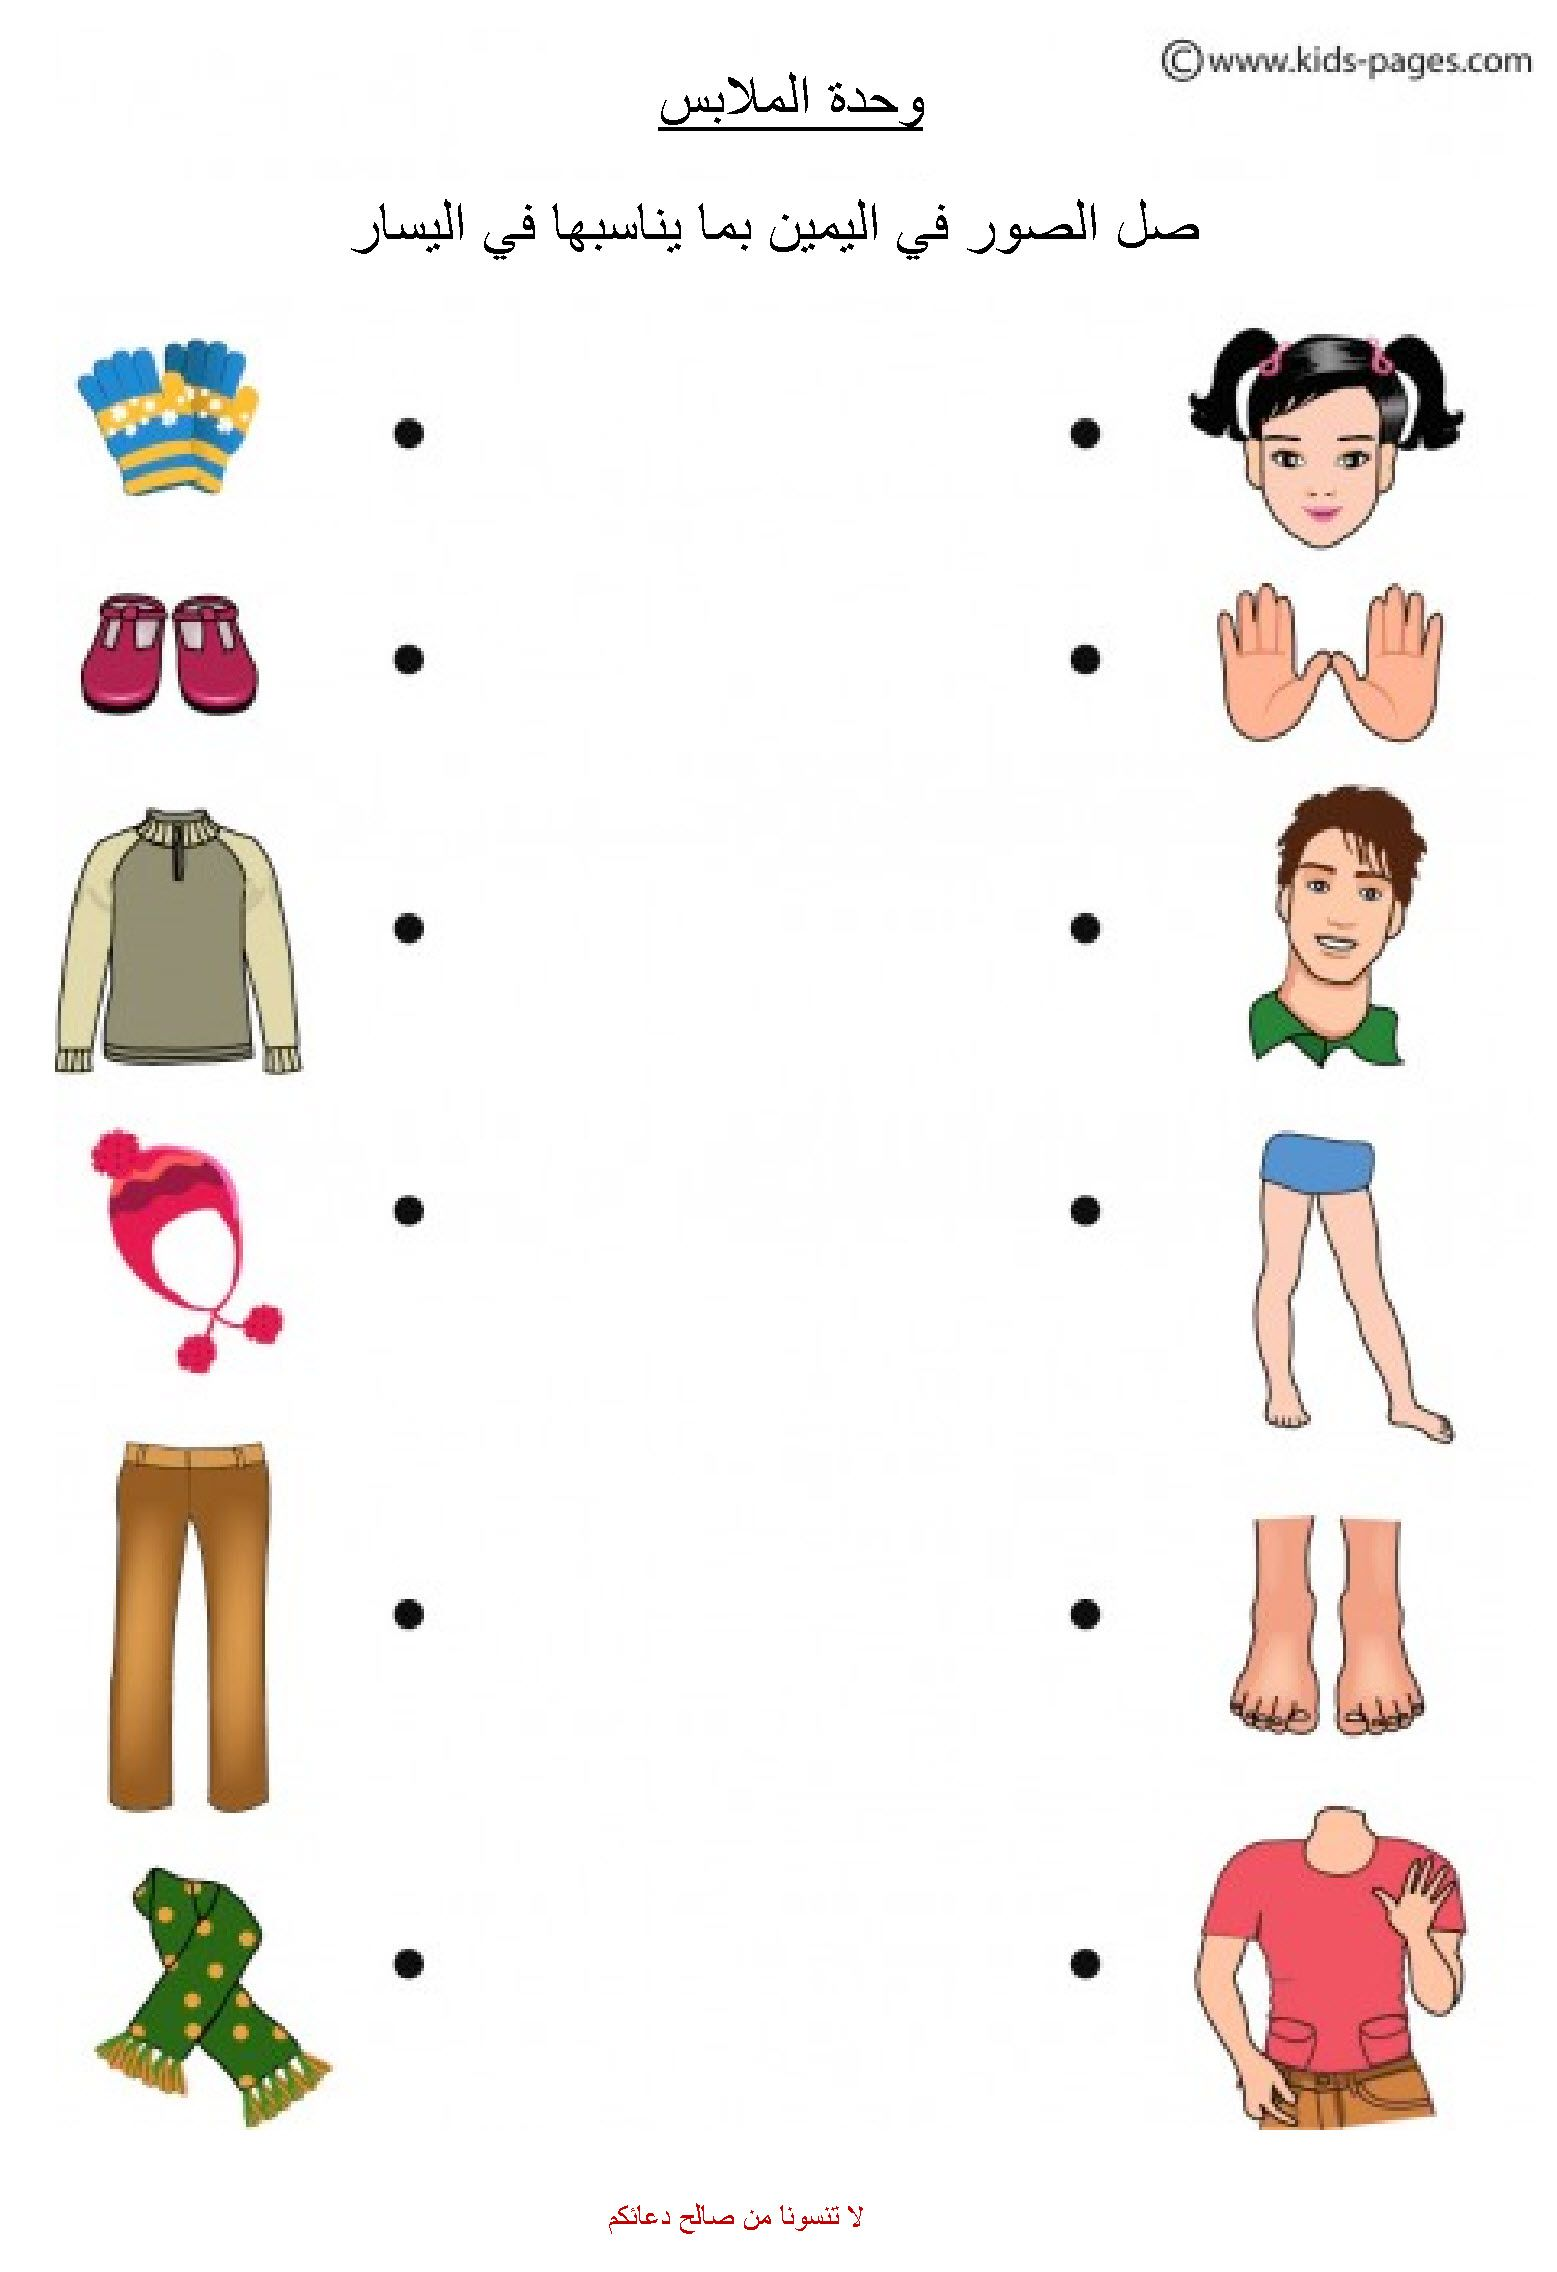 c883909fe ورقة عمل وحدة الملابس لمرحلة رياض الأطفال | رياض أطفال | Kids ...